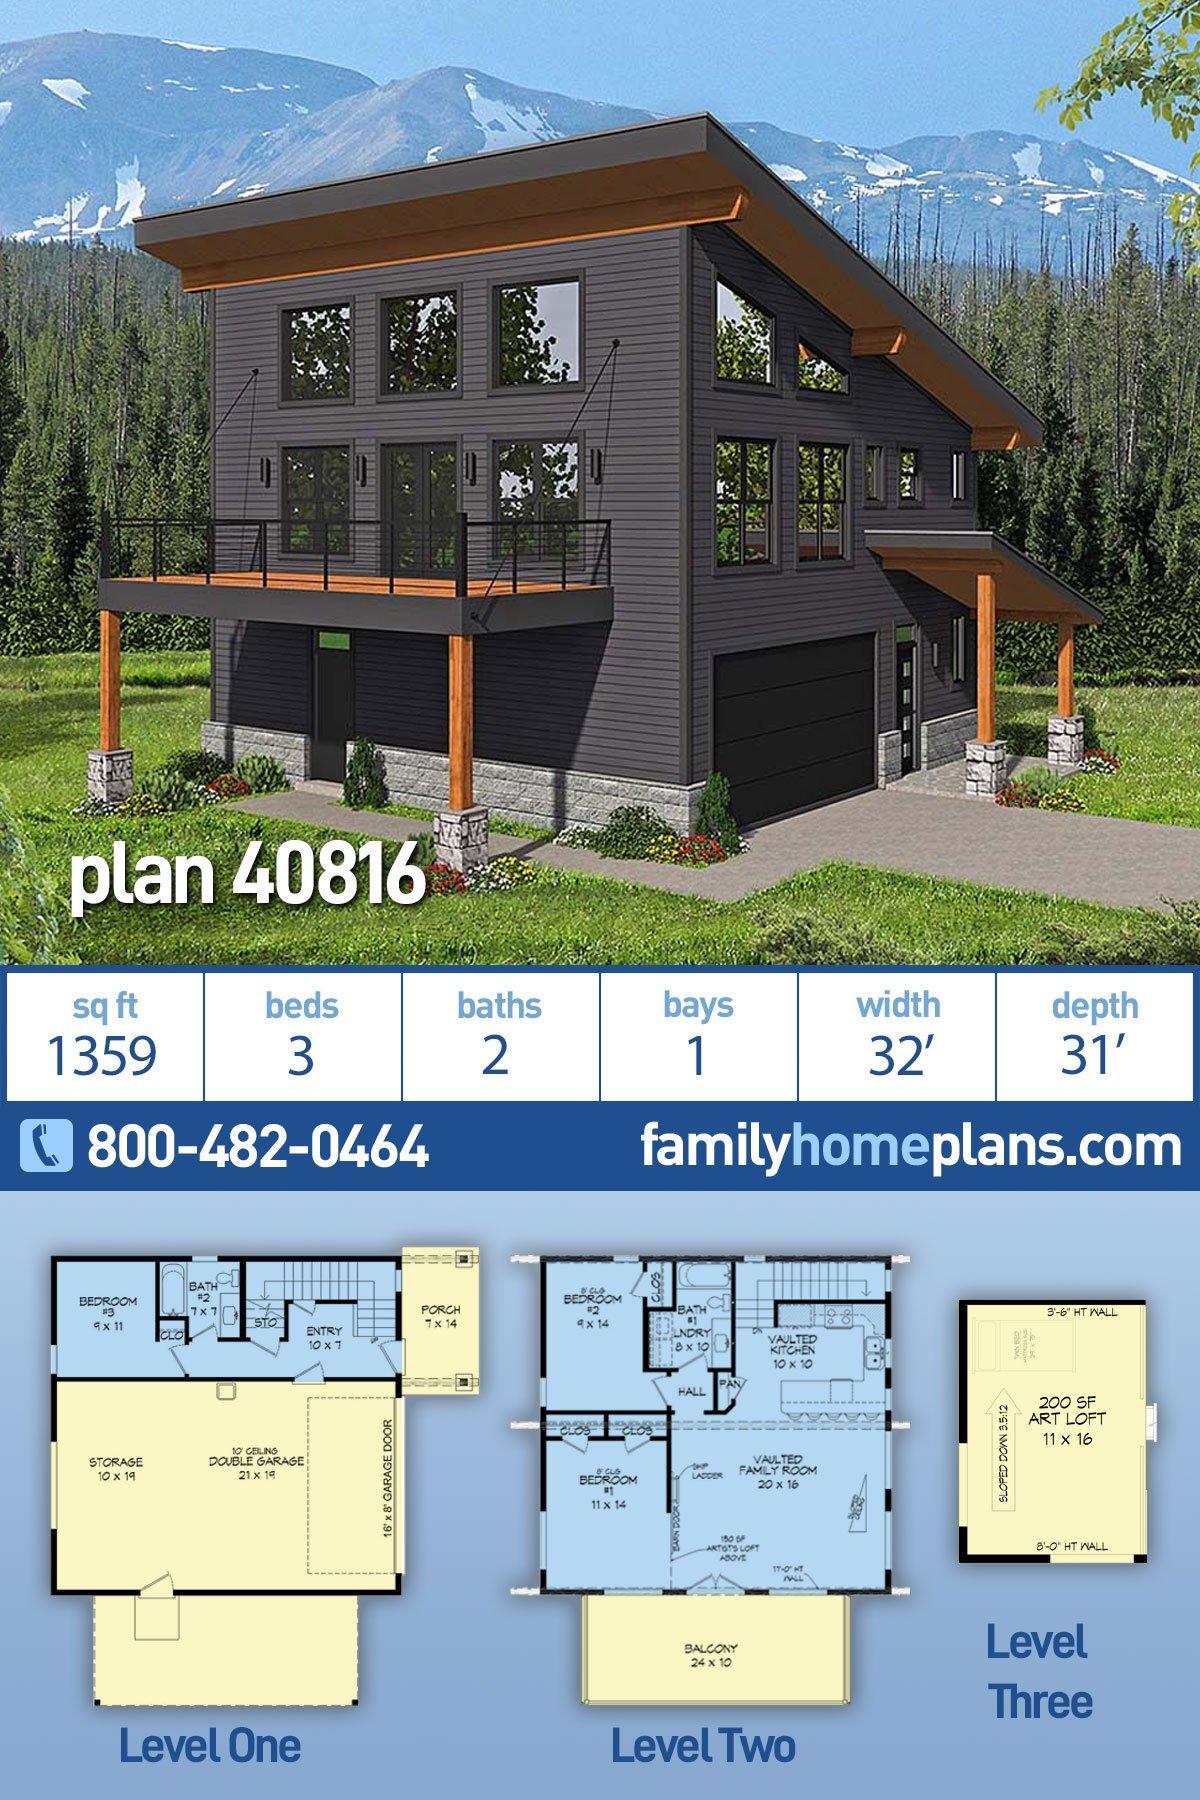 Contemporary , Modern Garage-Living Plan 40816 with 3 Beds, 2 Baths, 2 Car Garage